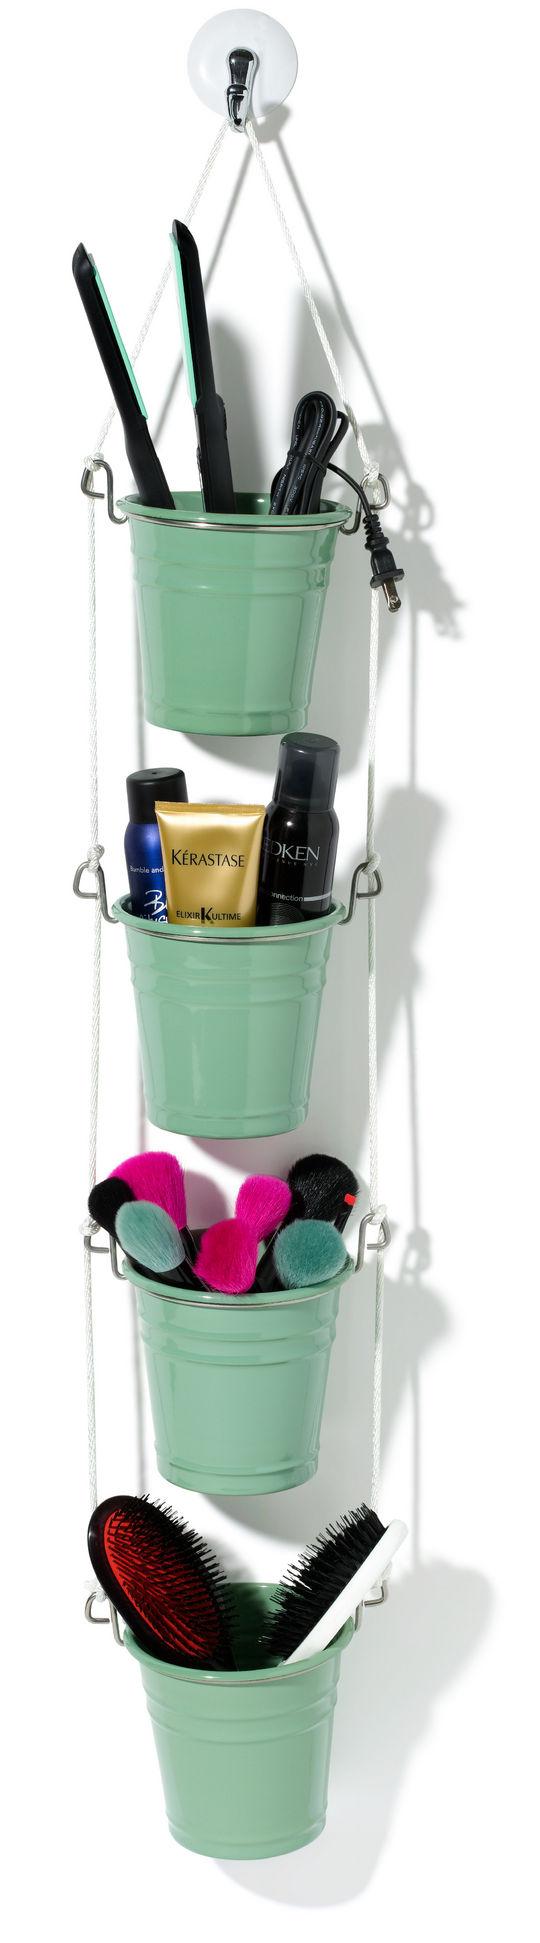 DIY beauty storage unit (via glamour)